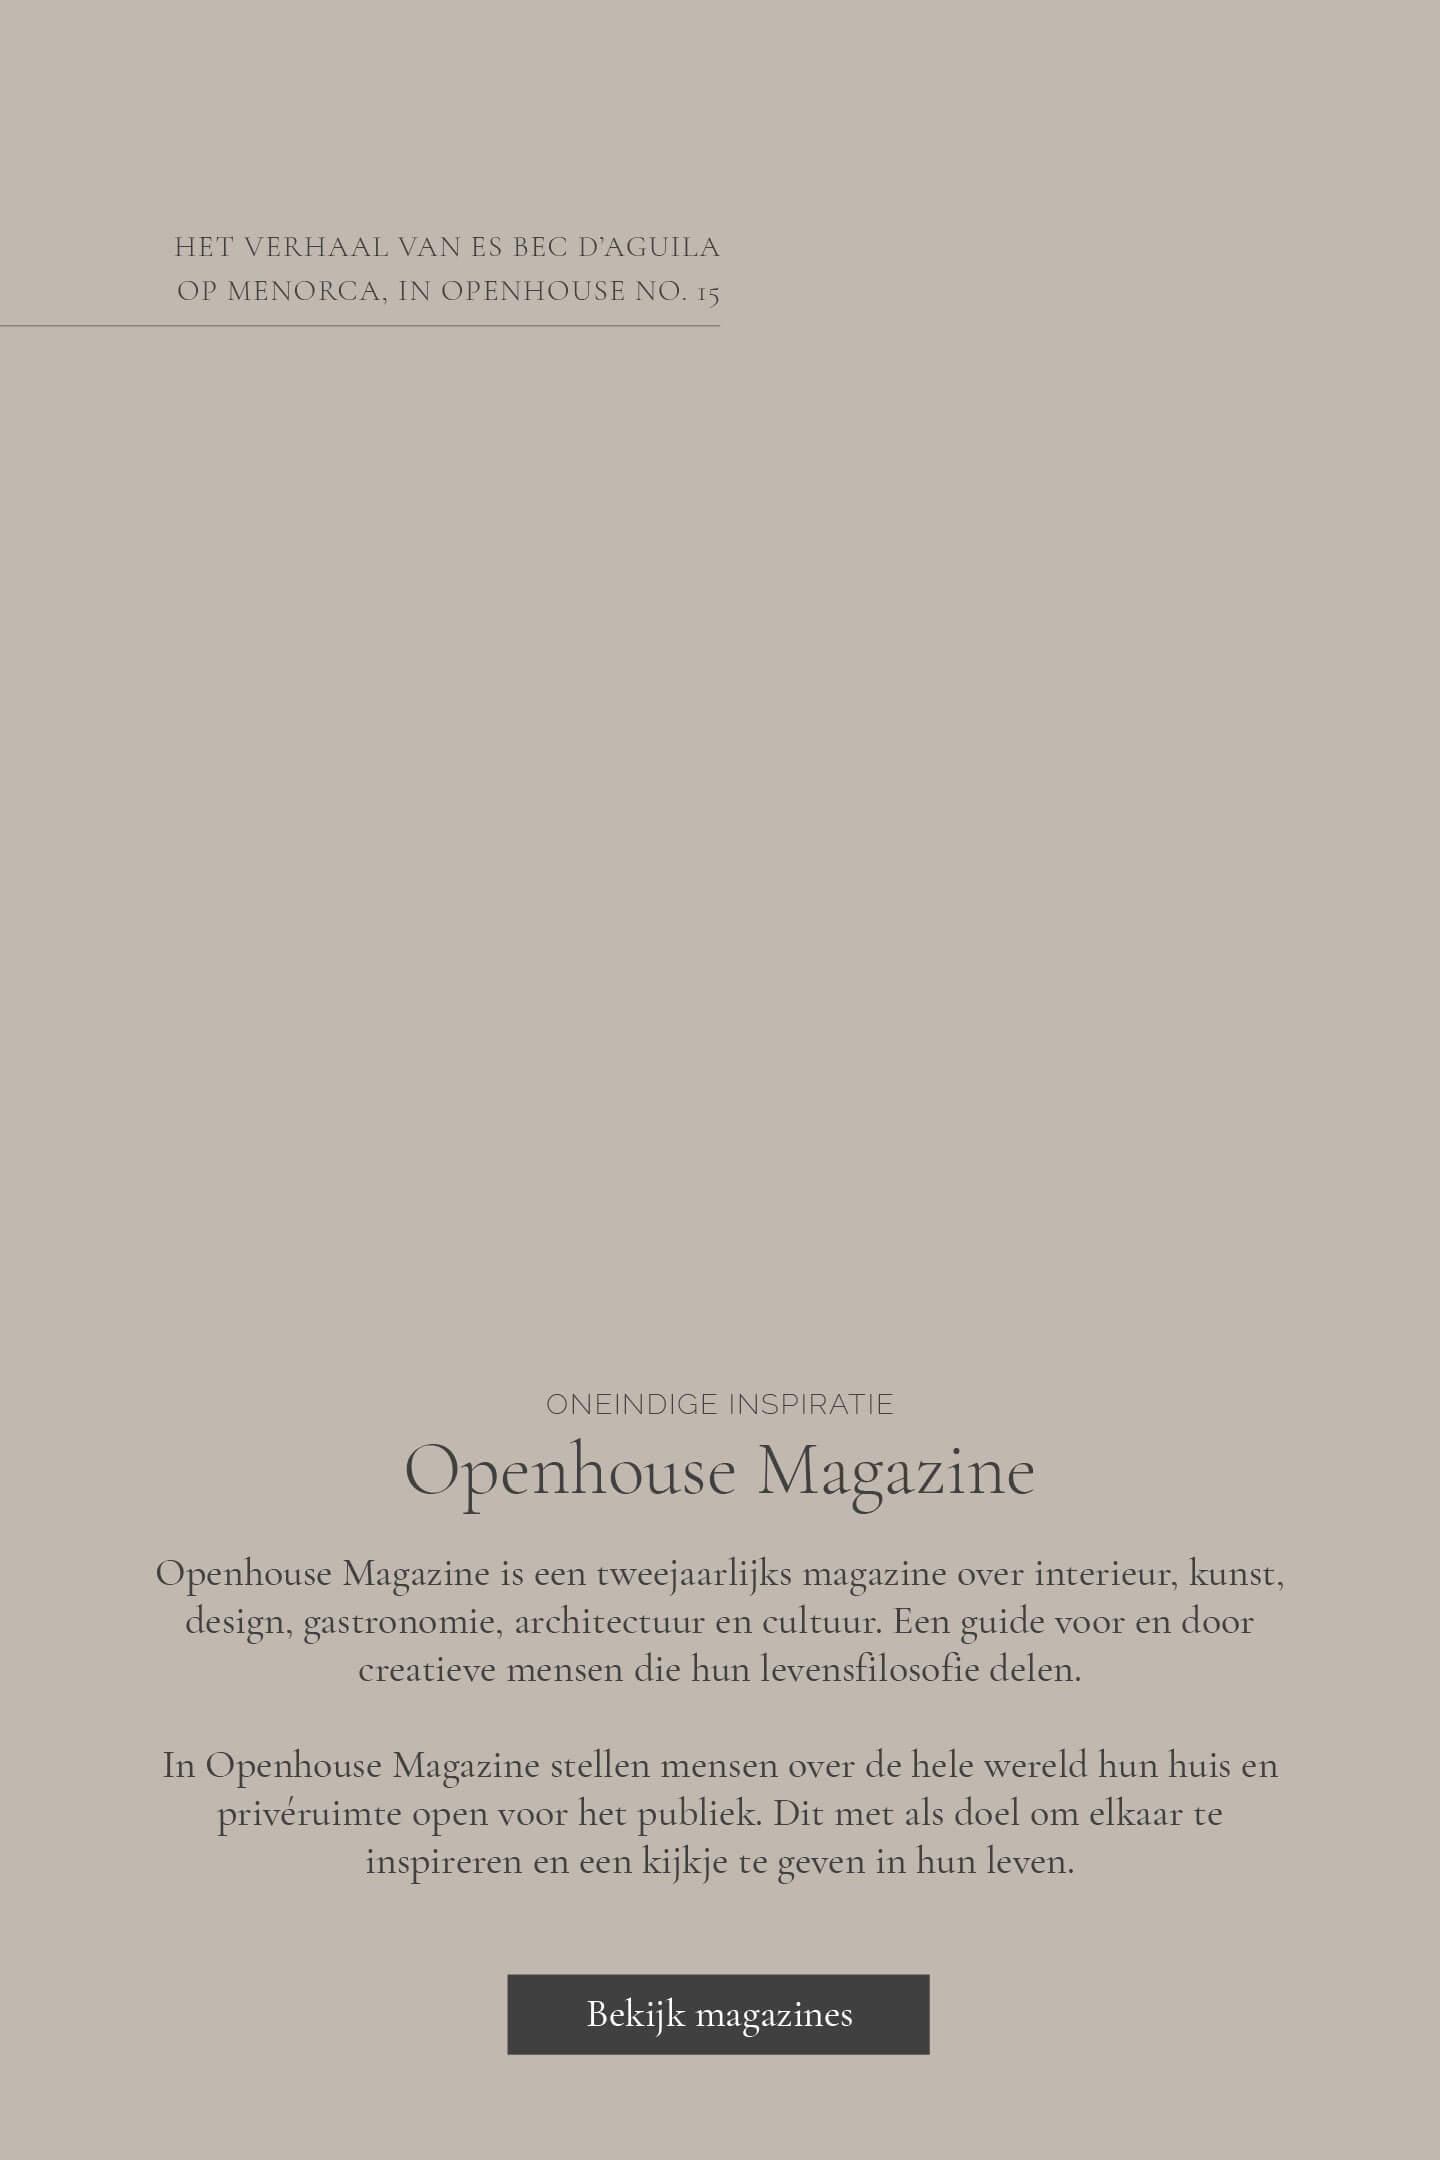 TWENTYTWONOTES | Openhouse Magazine Issue No. 15